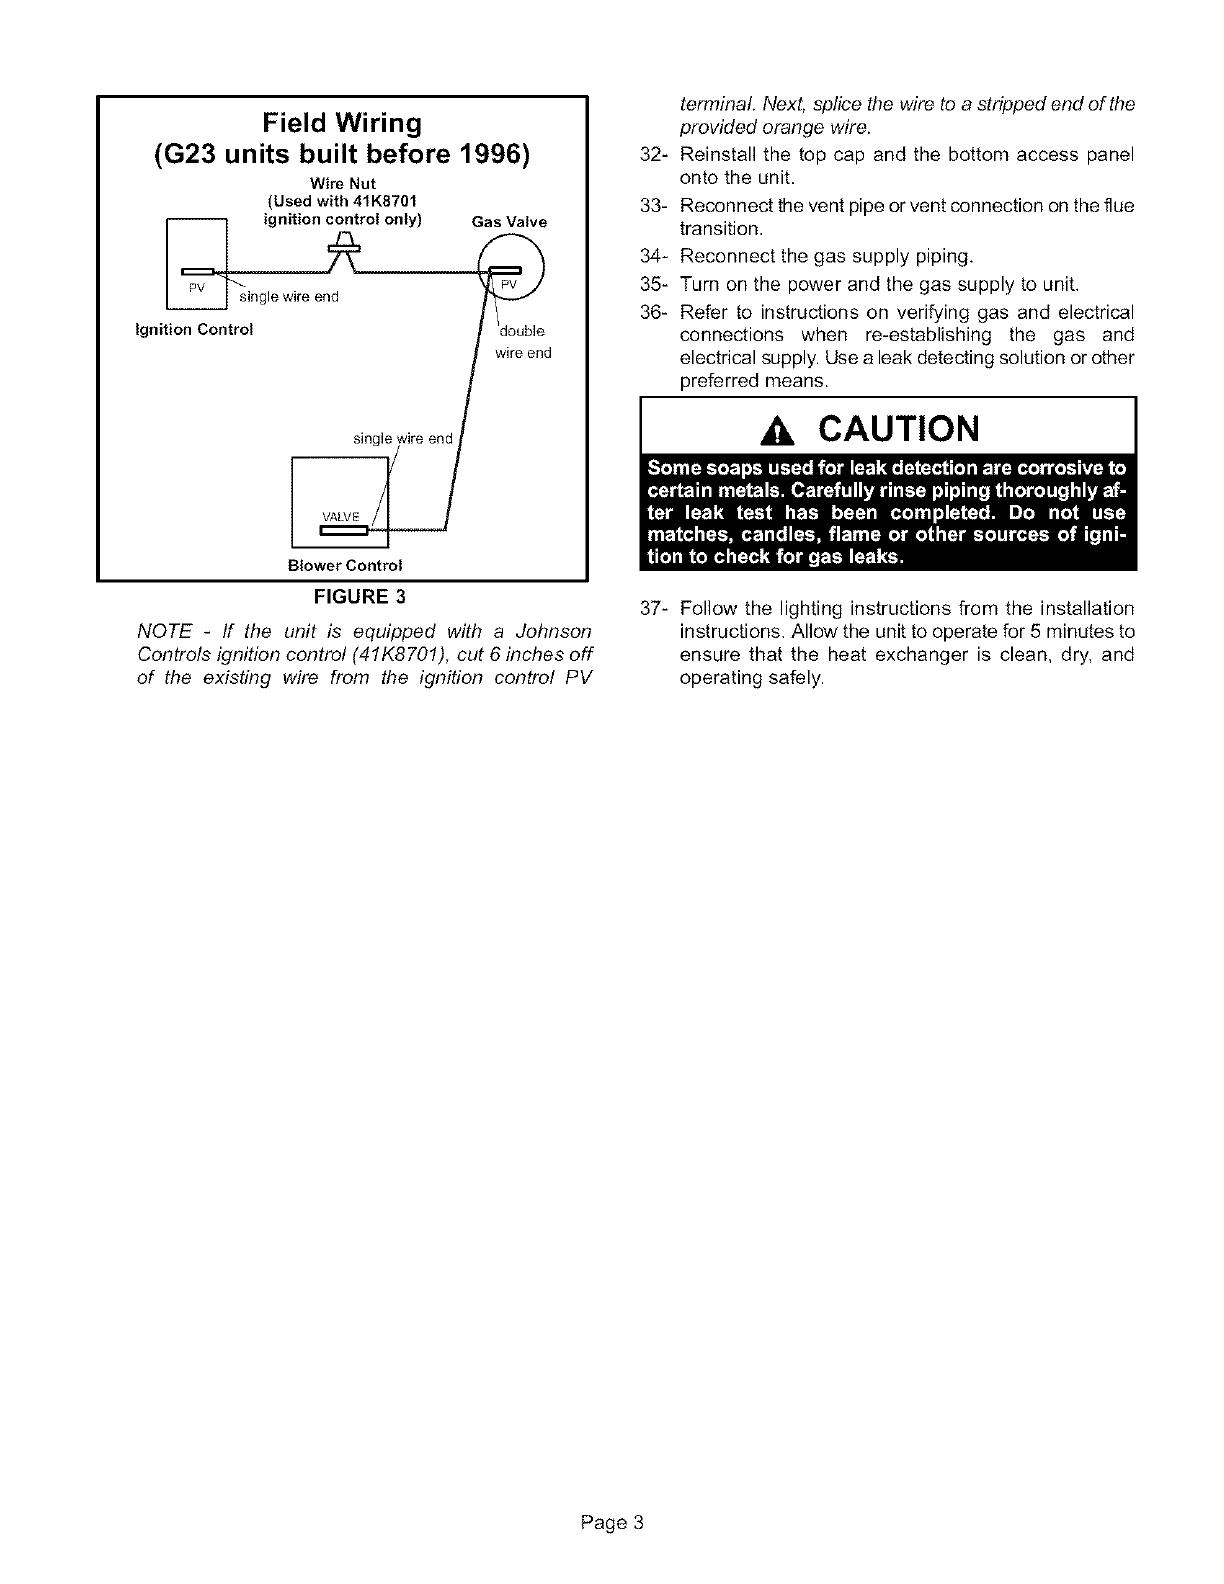 G23 Furnace Wiring Diagram Trusted Schematics Diagrams Gas Heat Lennox Heater Manual L0806911 Rh Usermanual Wiki Electric Old